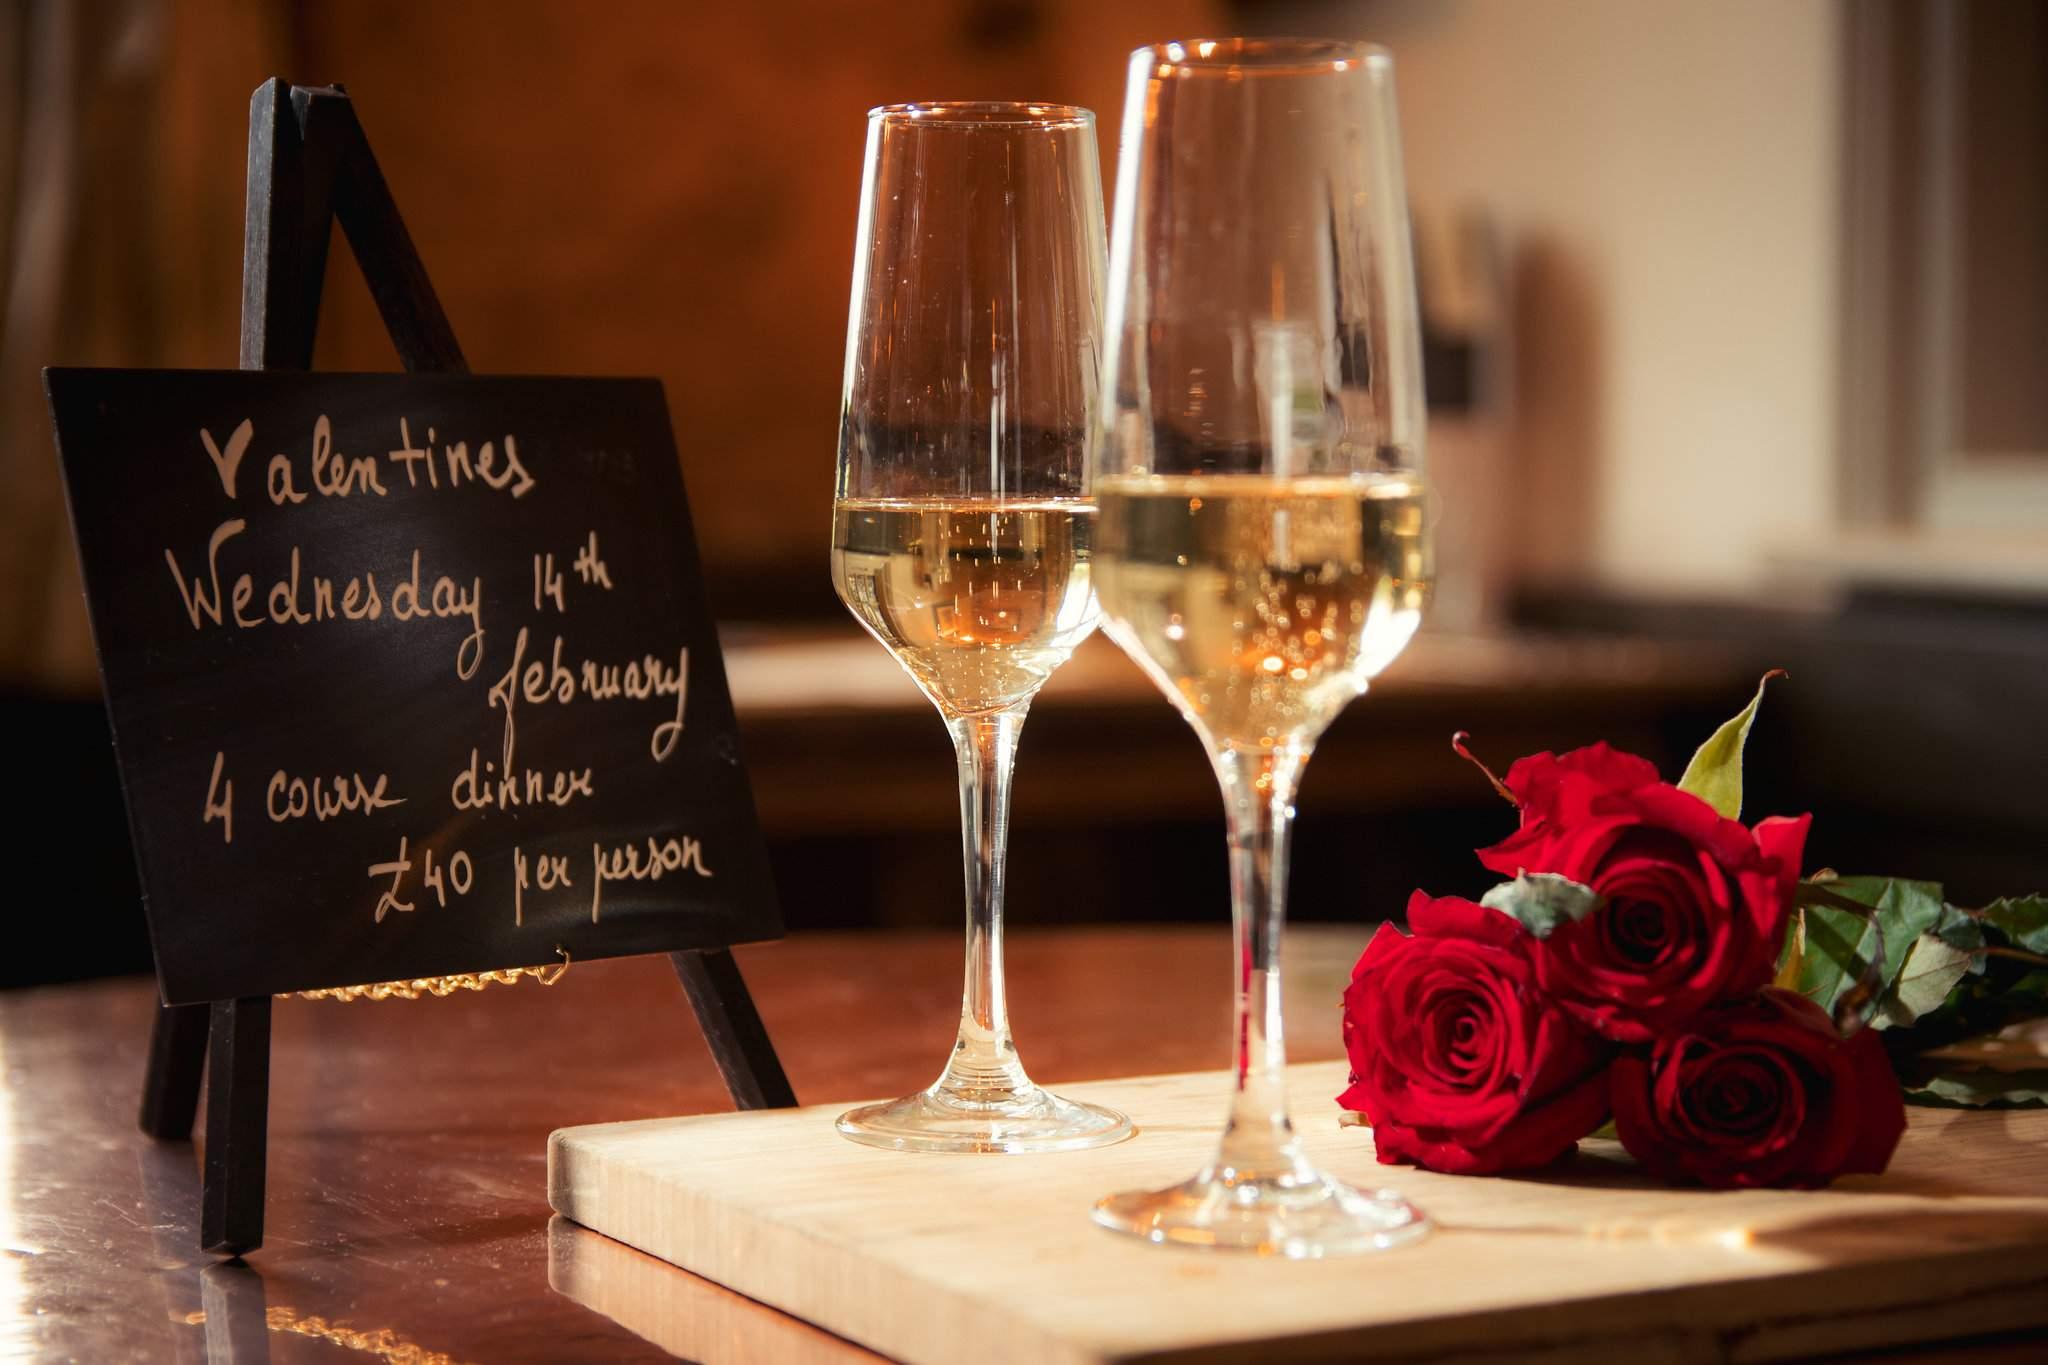 Valentines Dinner - Wednesday 14th February